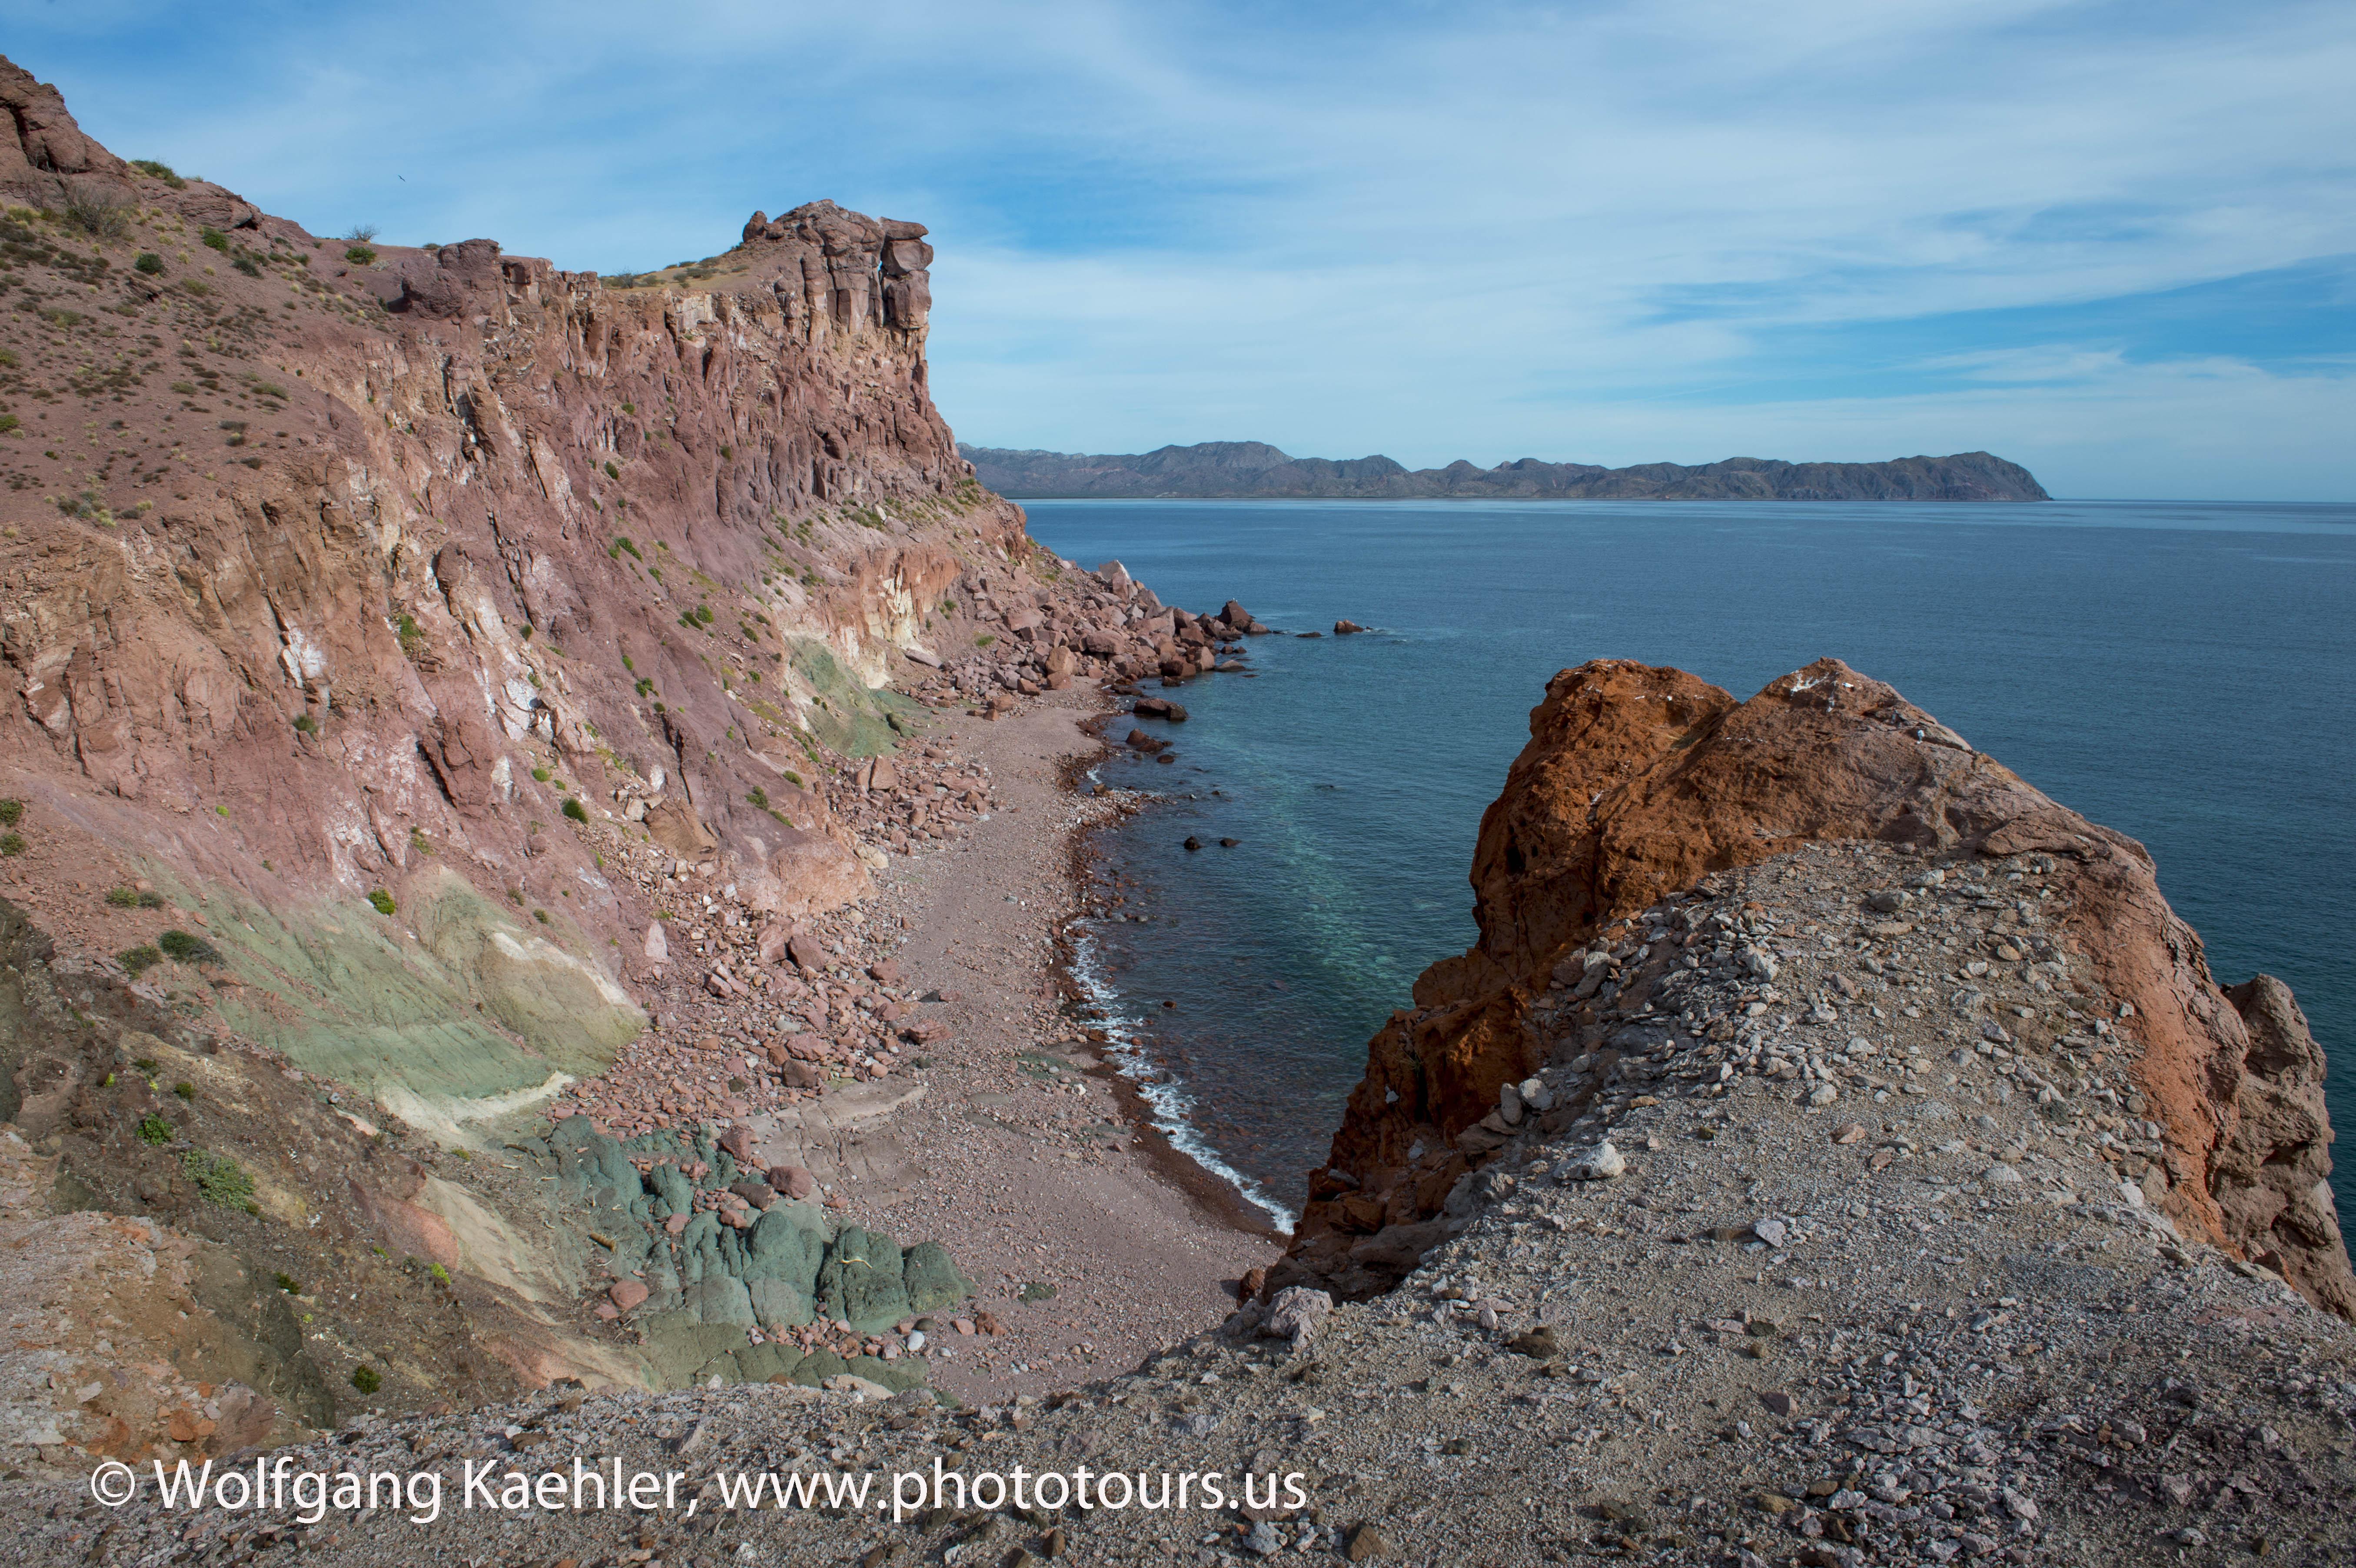 Baja California With Un Cruise Day 5 Photo Tours